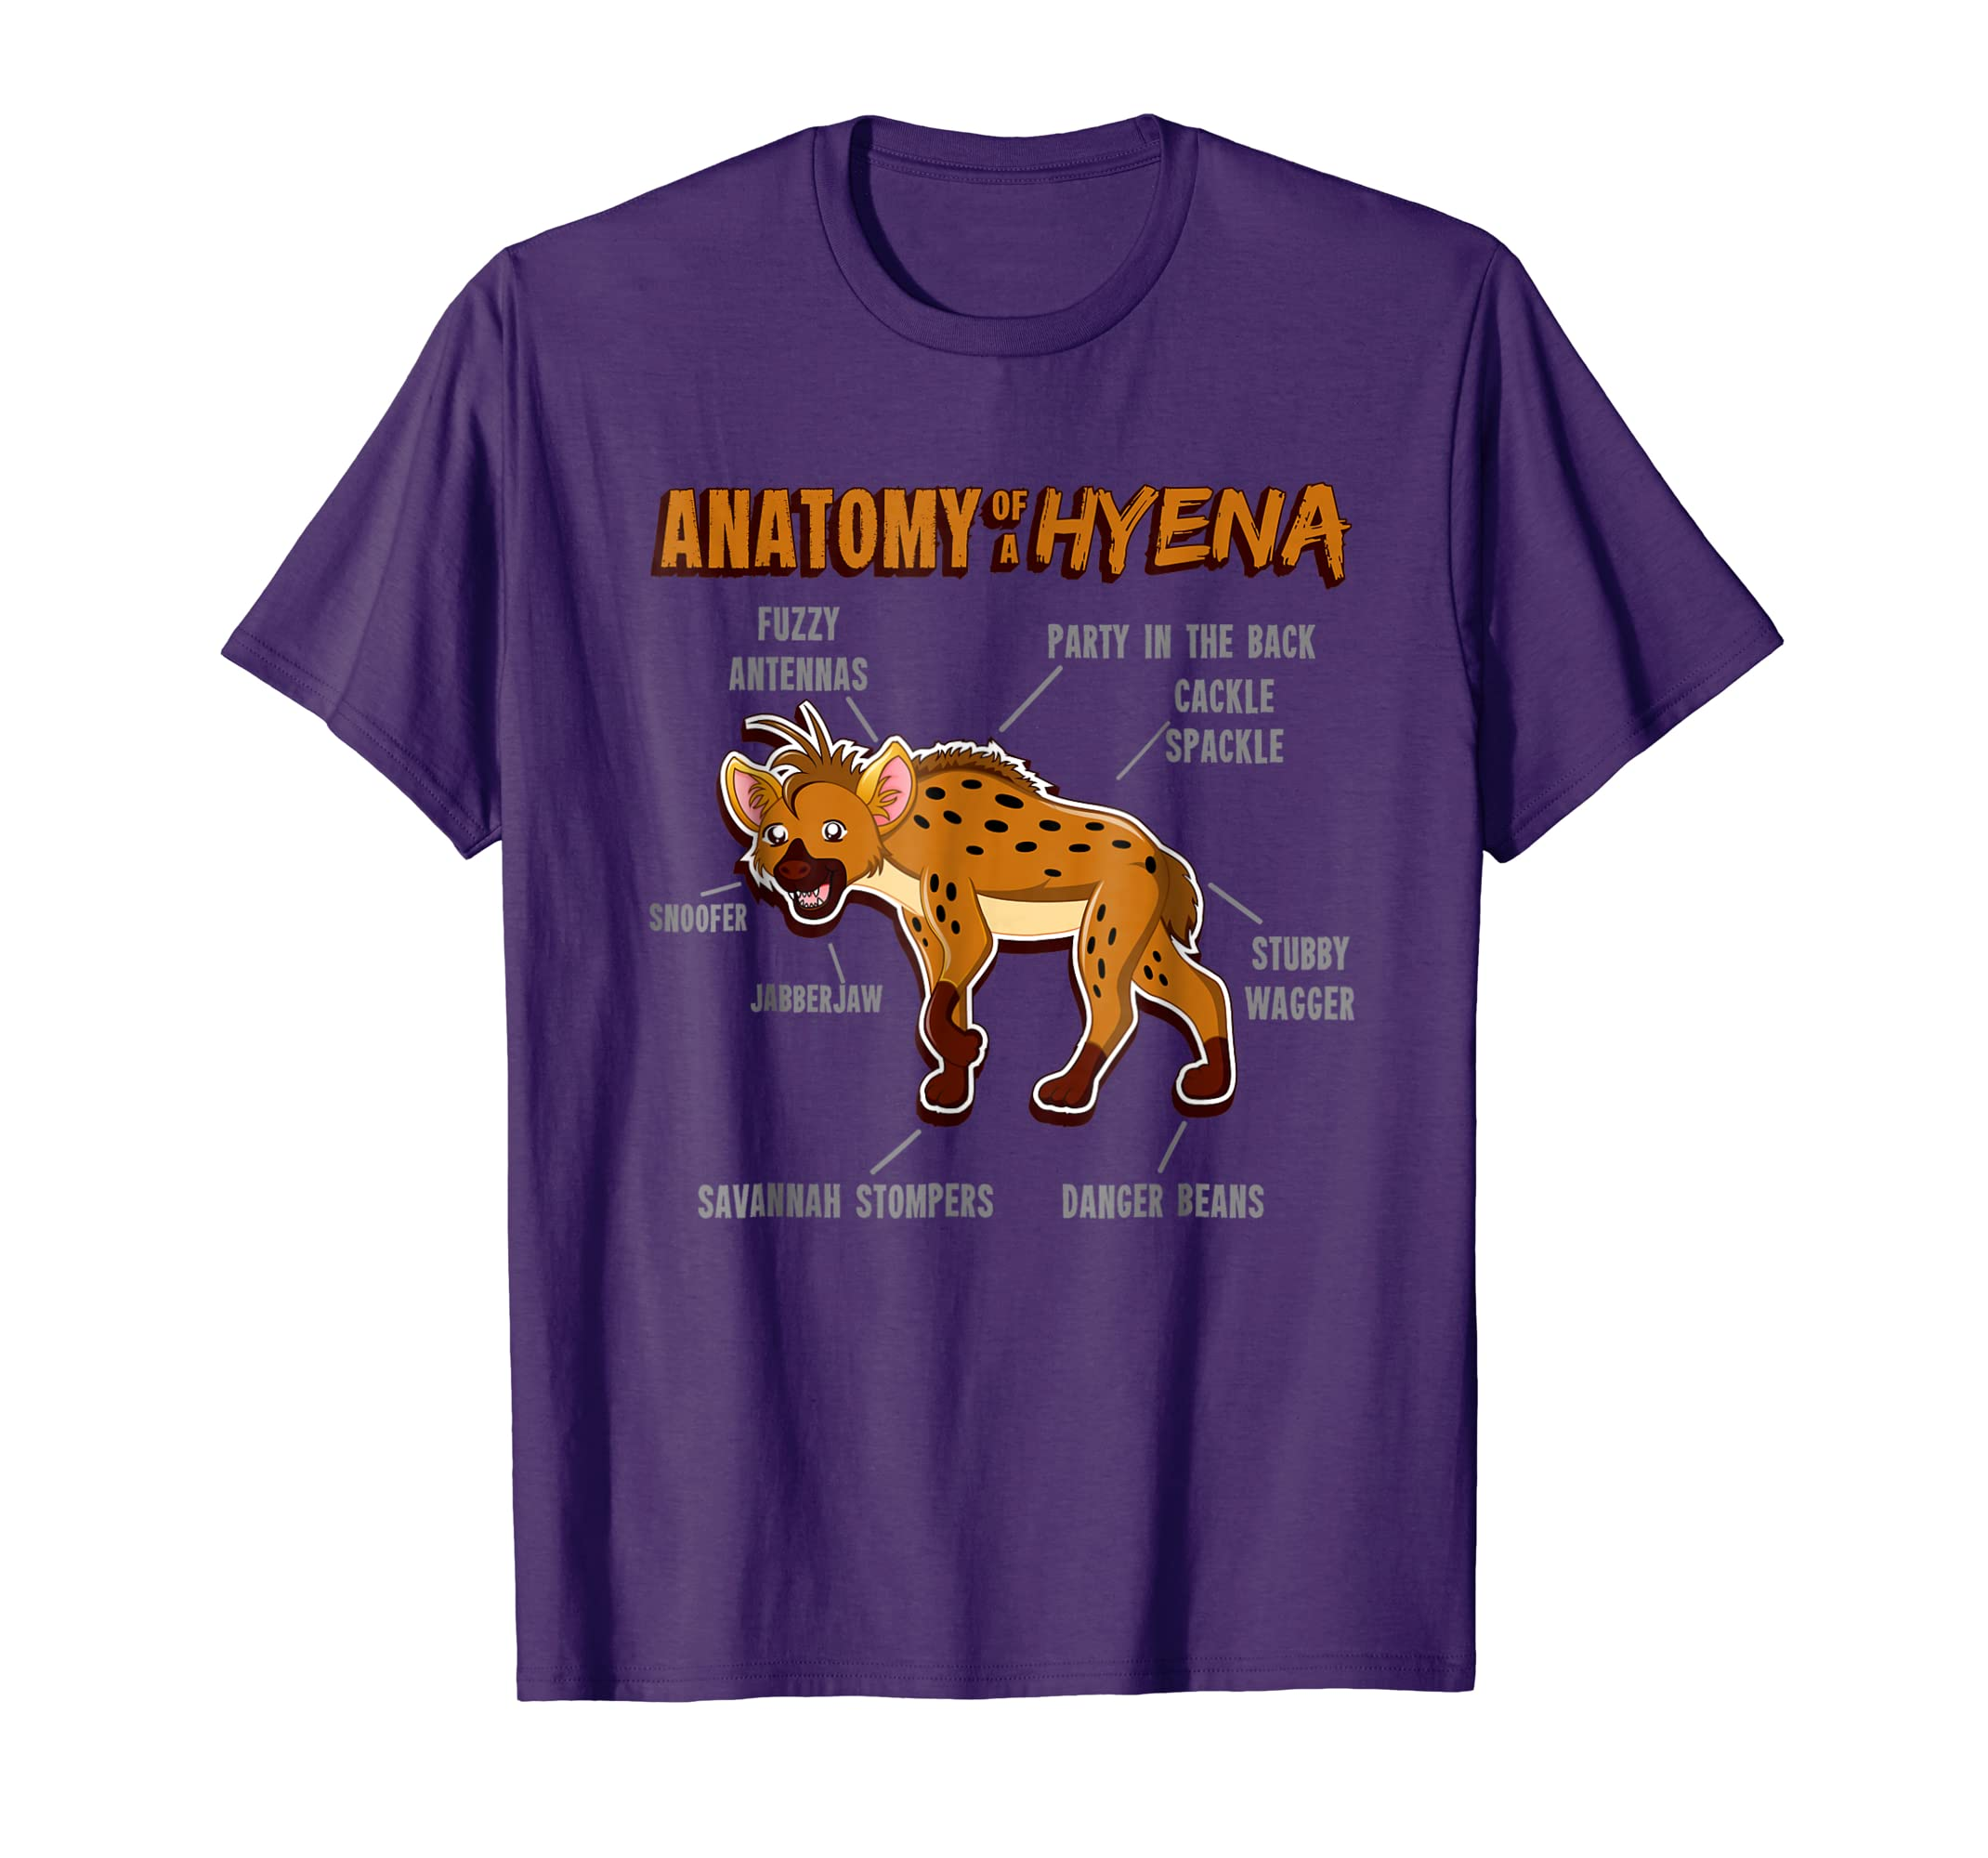 Amazon.com: Furry shirt - zoo animal shirt boys - Anatomy of a Hyena ...